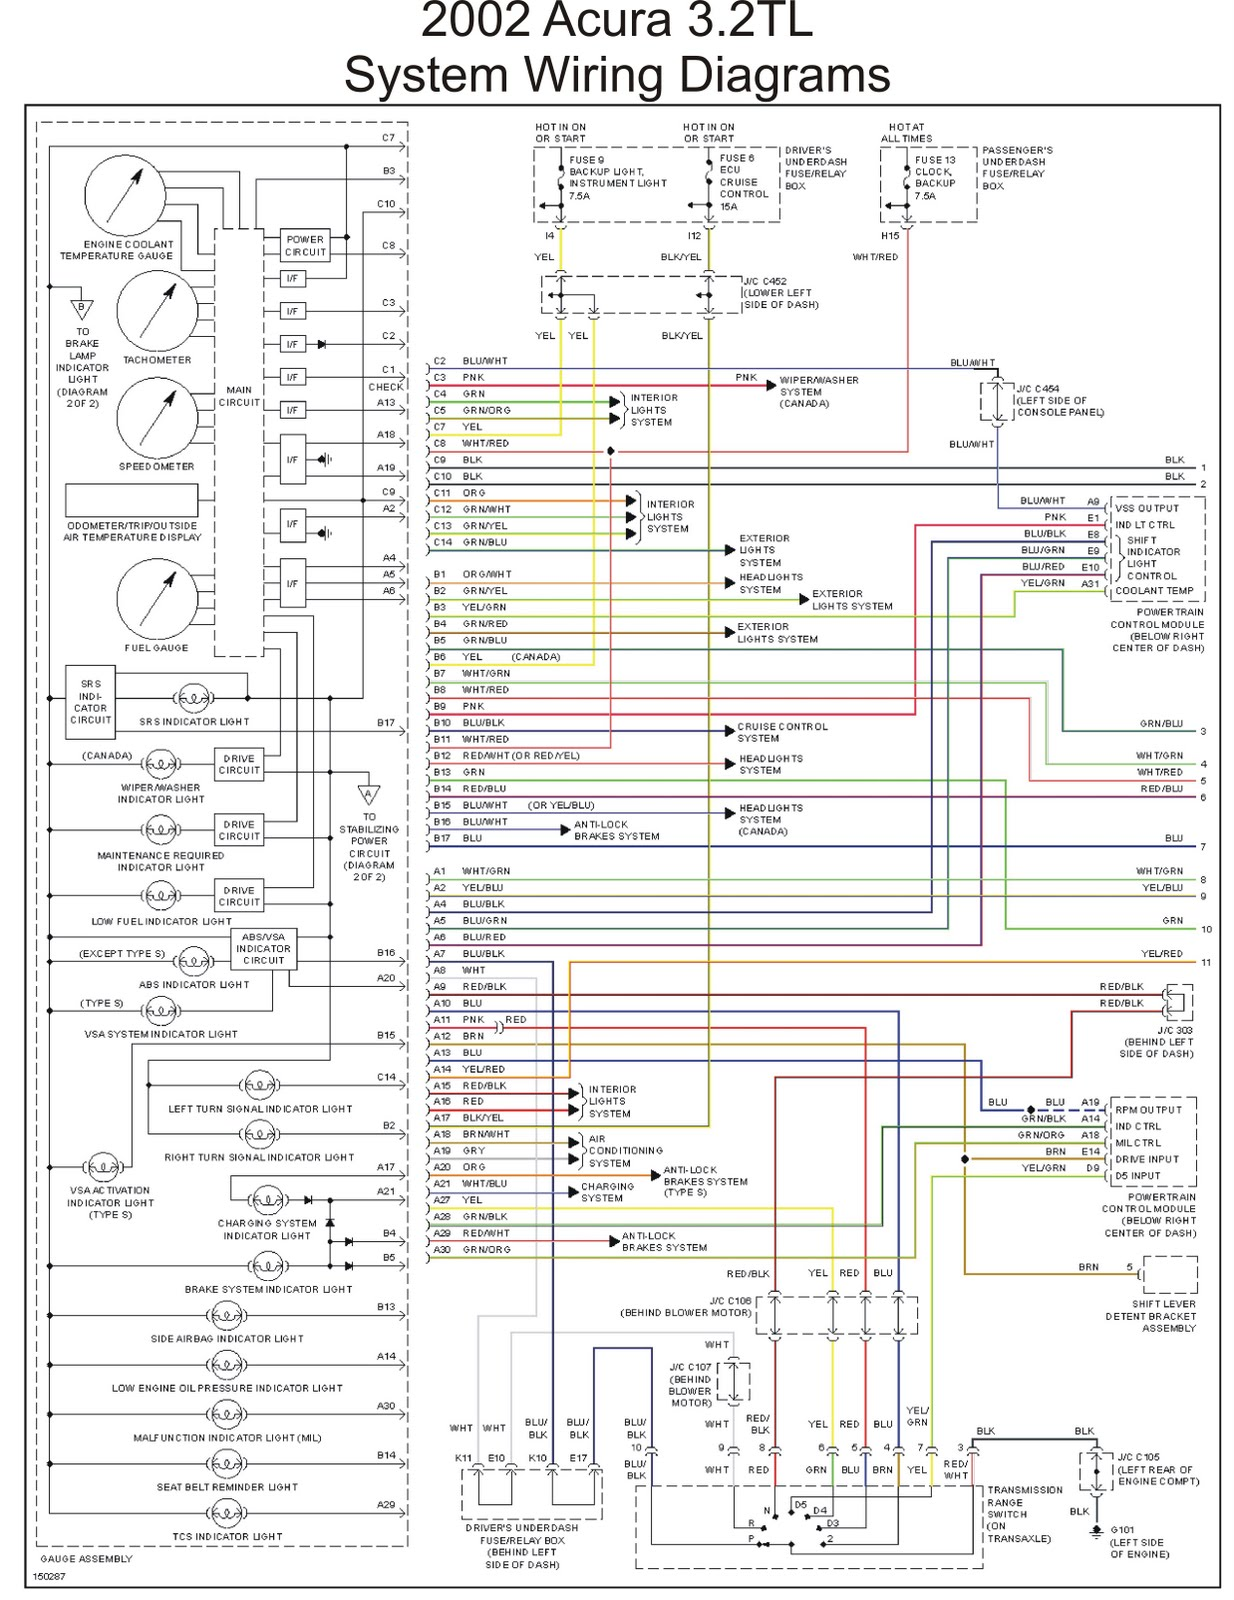 2002 honda cr v radio wiring diagram free download wiring diagrams  lovely 2002 honda civic wiring diagram ideas electrical and fine honda civic stereo wiring diagram images electrical circuit at 2002 honda crv radio wiring